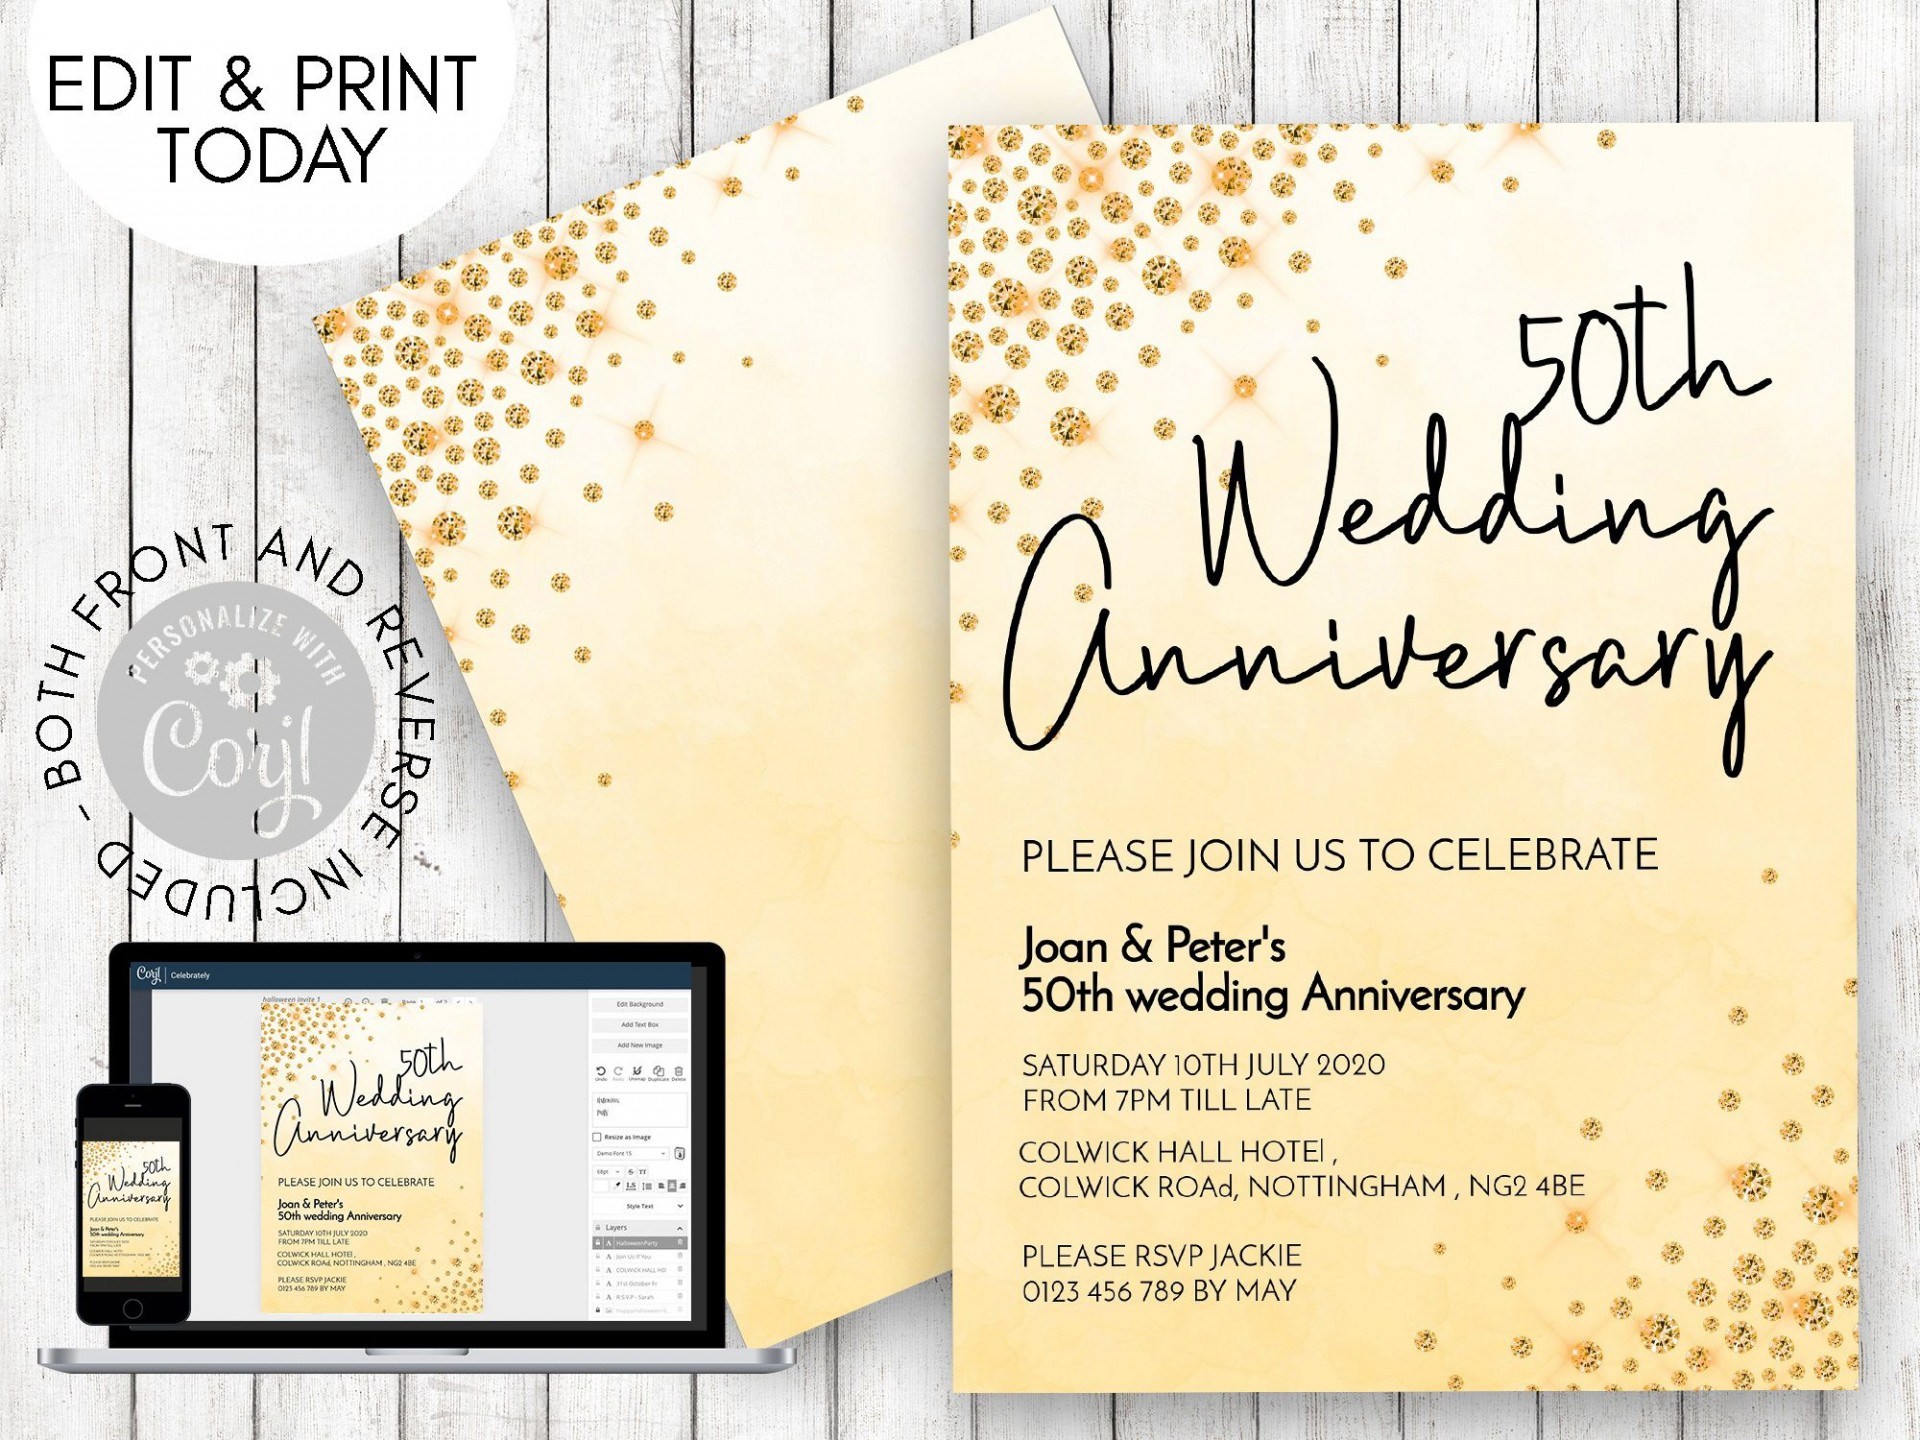 003 Rare 50th Anniversary Invitation Template Free Download High Resolution  Golden Wedding1920